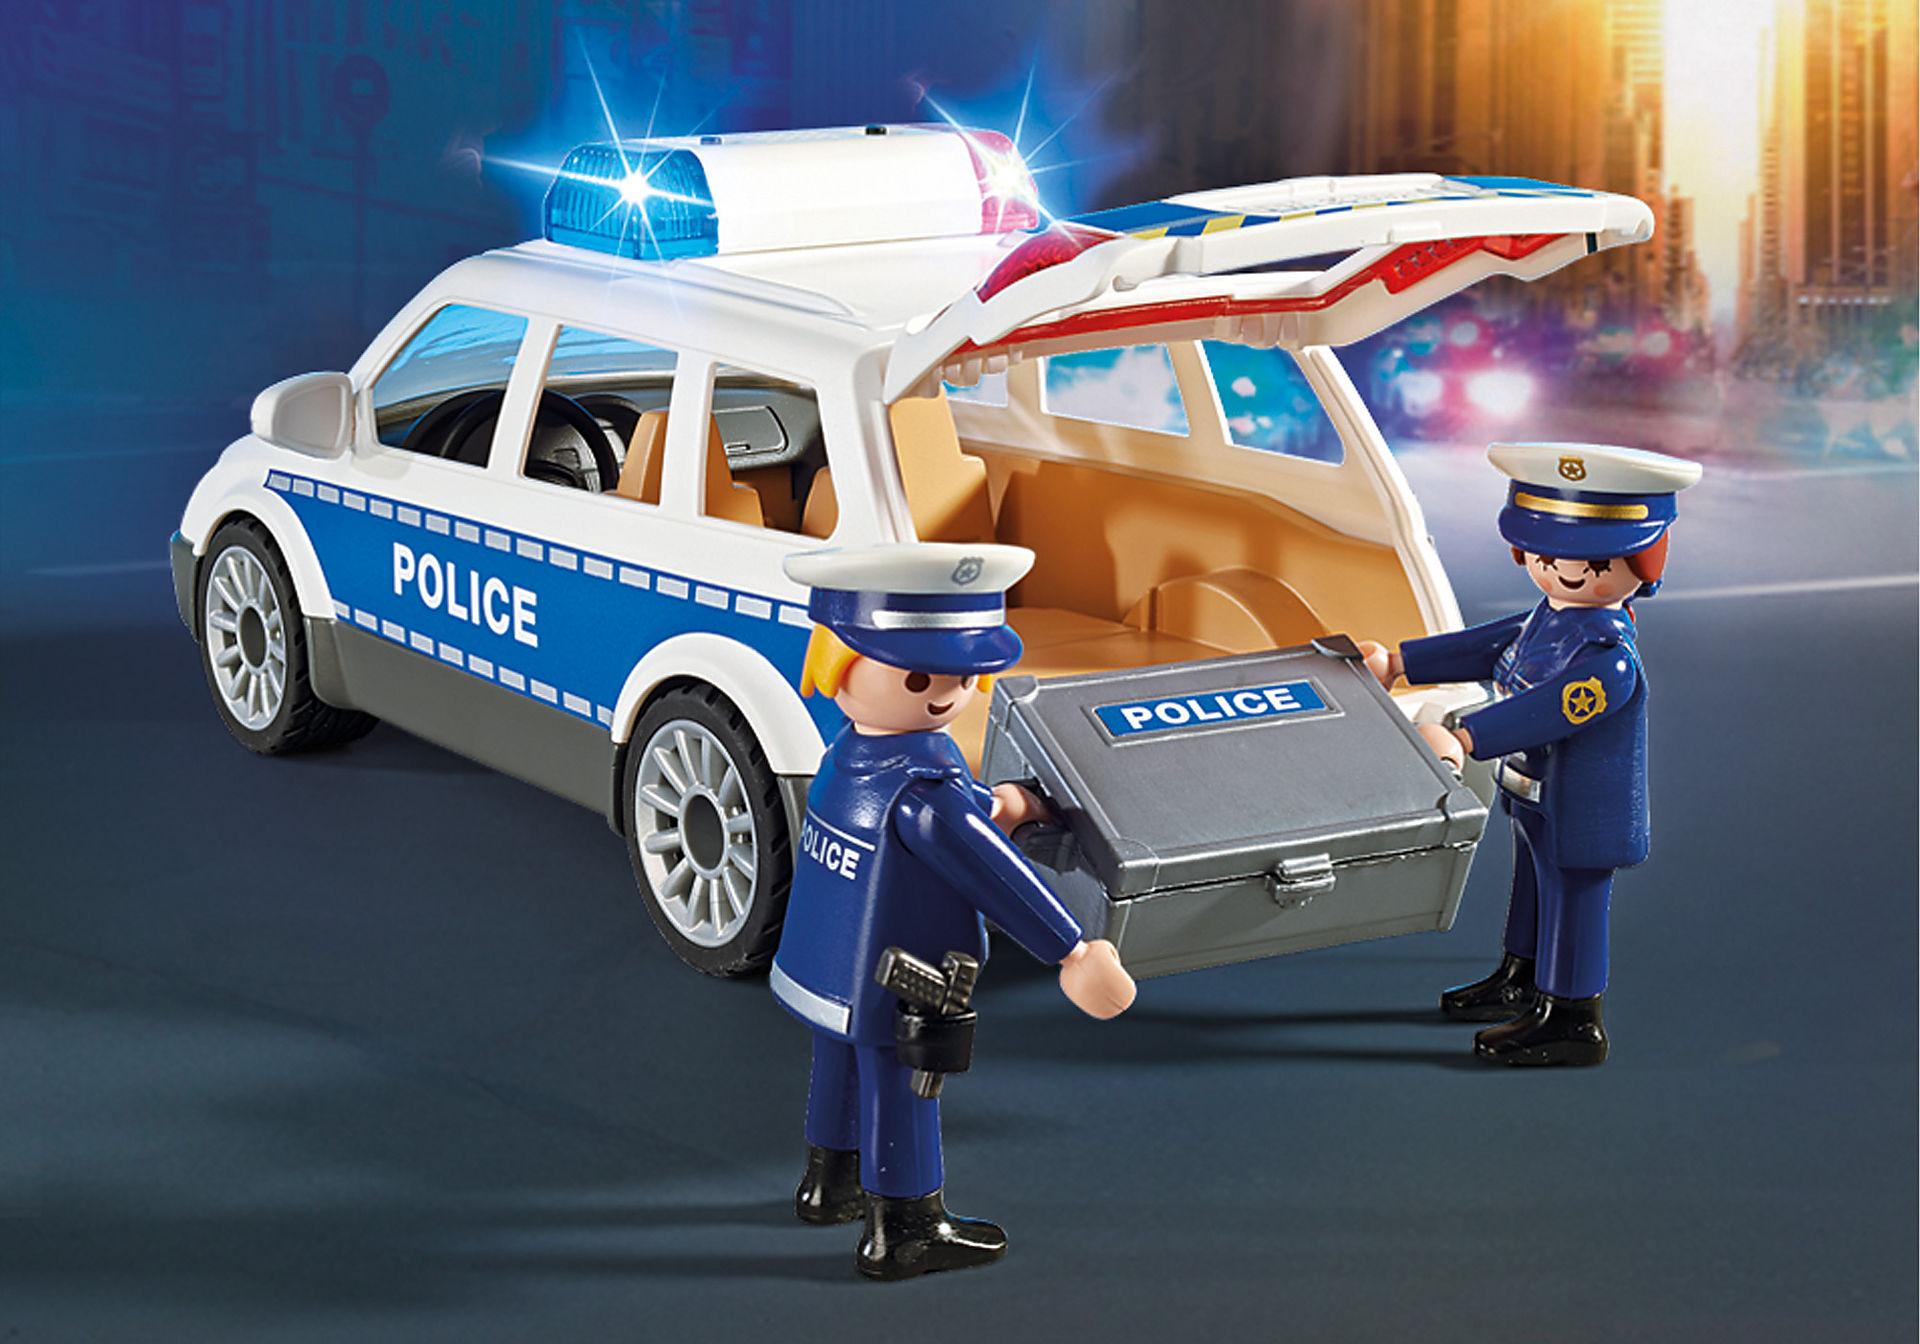 http://media.playmobil.com/i/playmobil/6920_product_extra2/Coche de Policía con Luces y Sonido